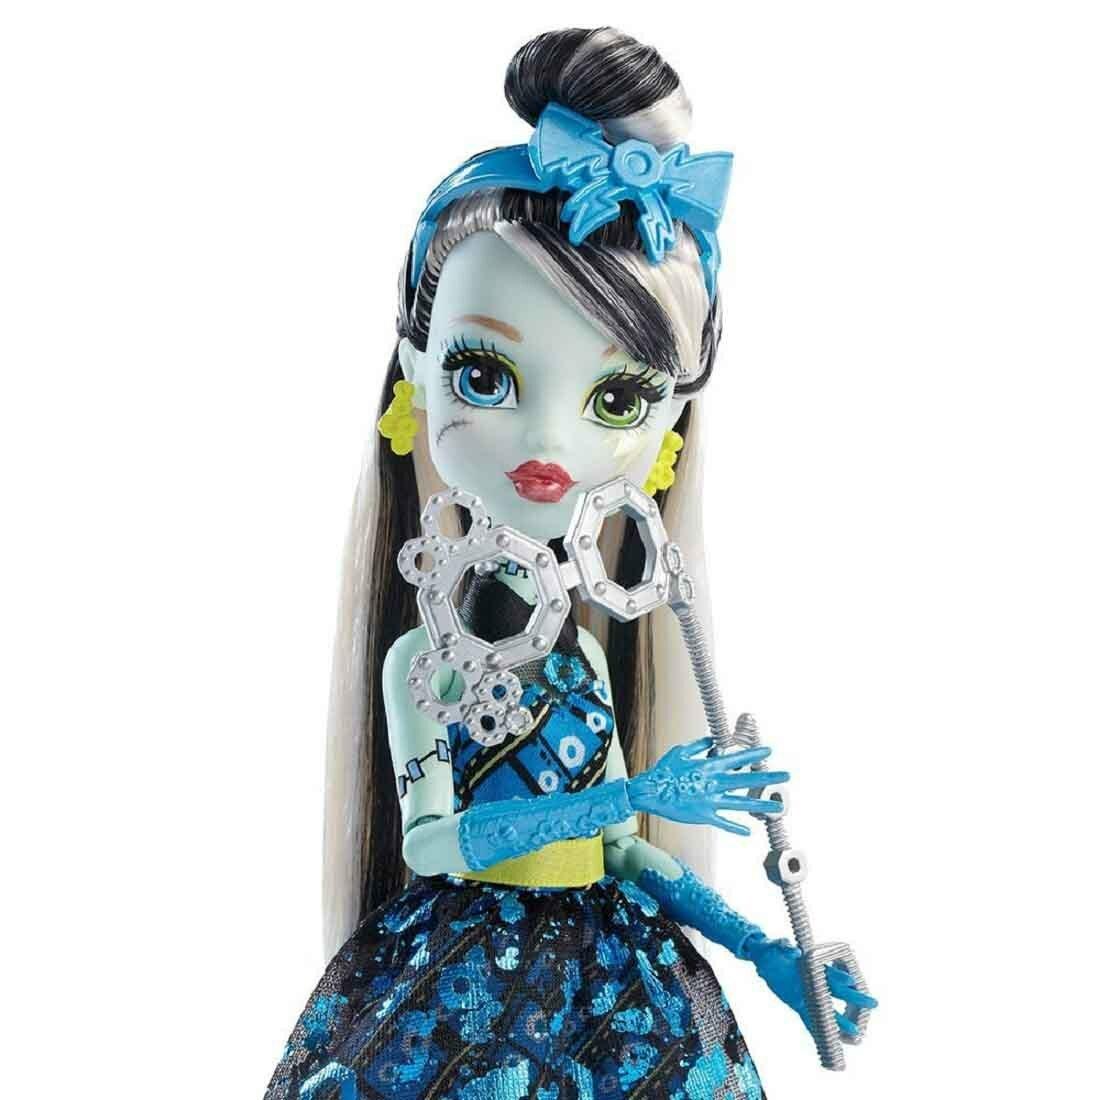 фото куклы монстер хай фрэнки штейн сходна королевской